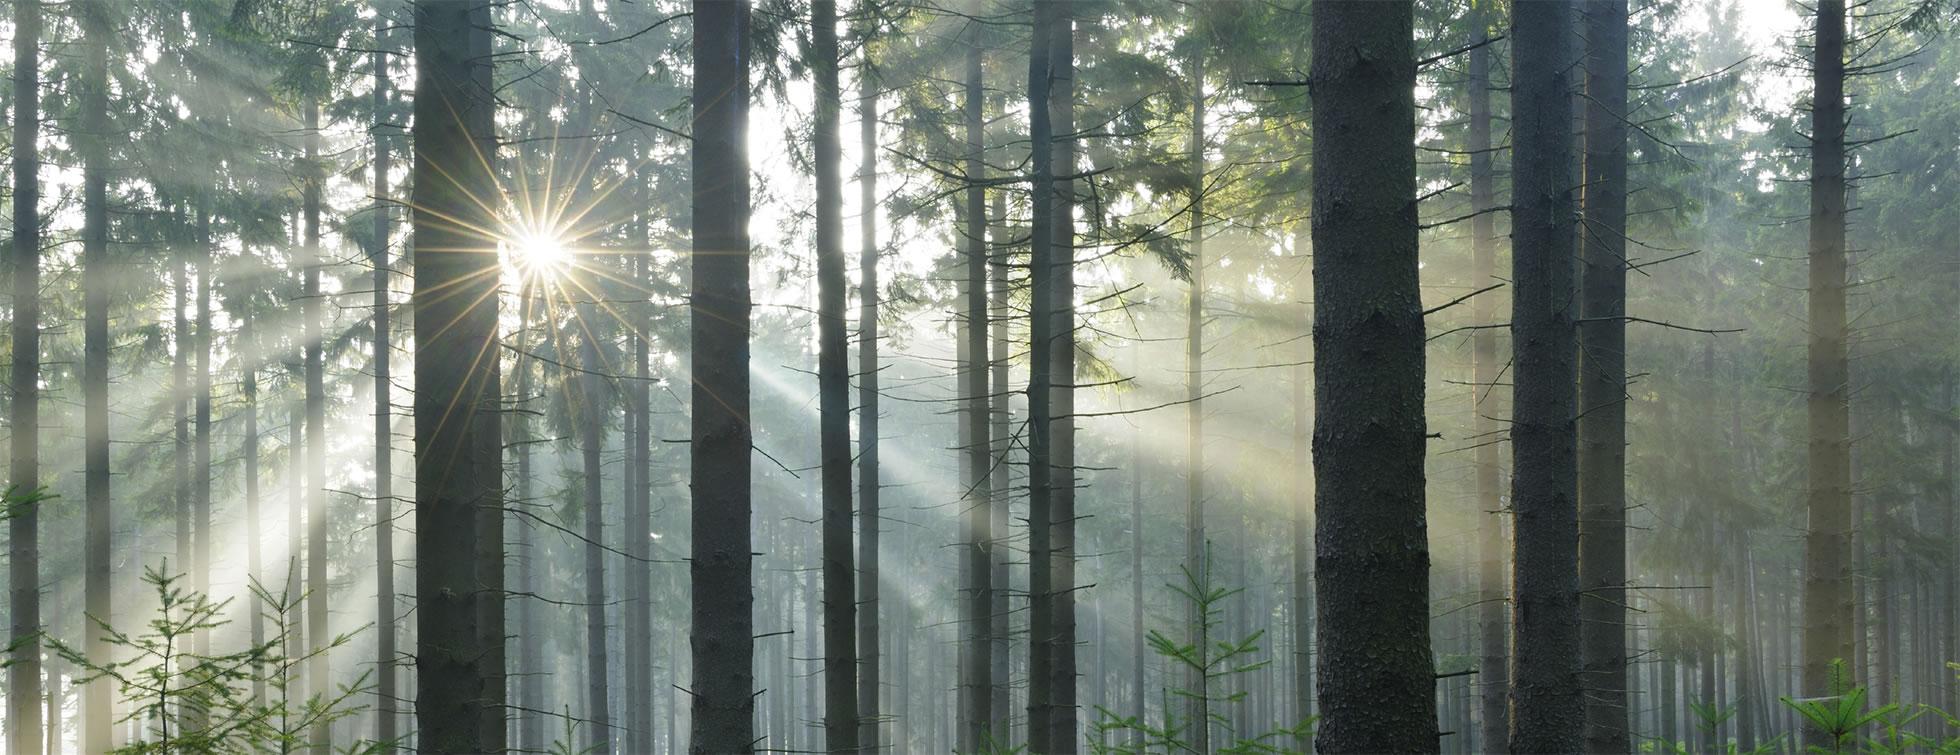 transparentforest